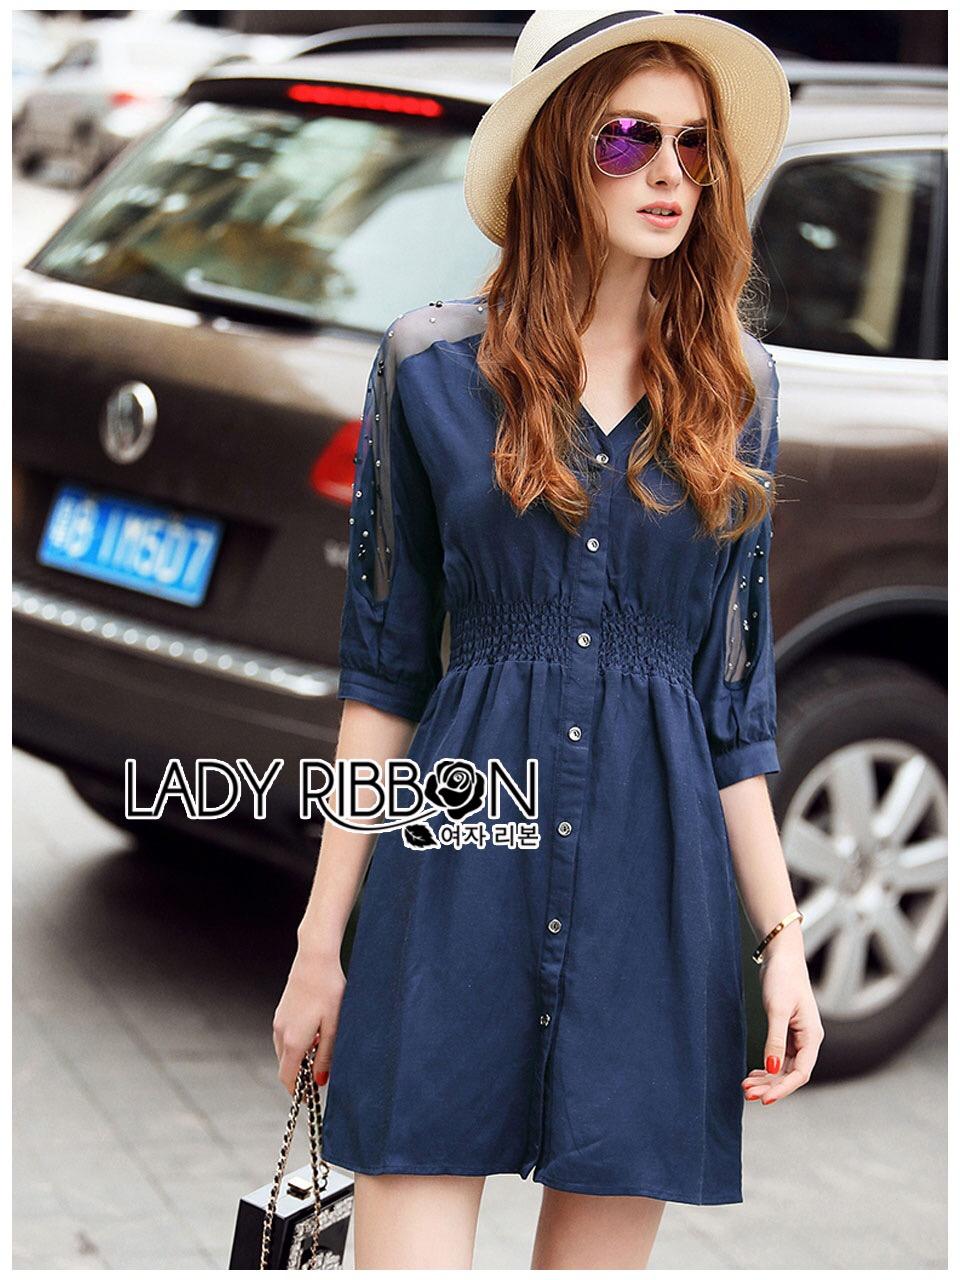 Lady Ribbon Korea Dress LR10060616 &#x1F380 Lady Ribbon's Made &#x1F380 Lady Natalie Minimal Chic Crystal Embroidered Organza and Denim Cotton Shirt Dress